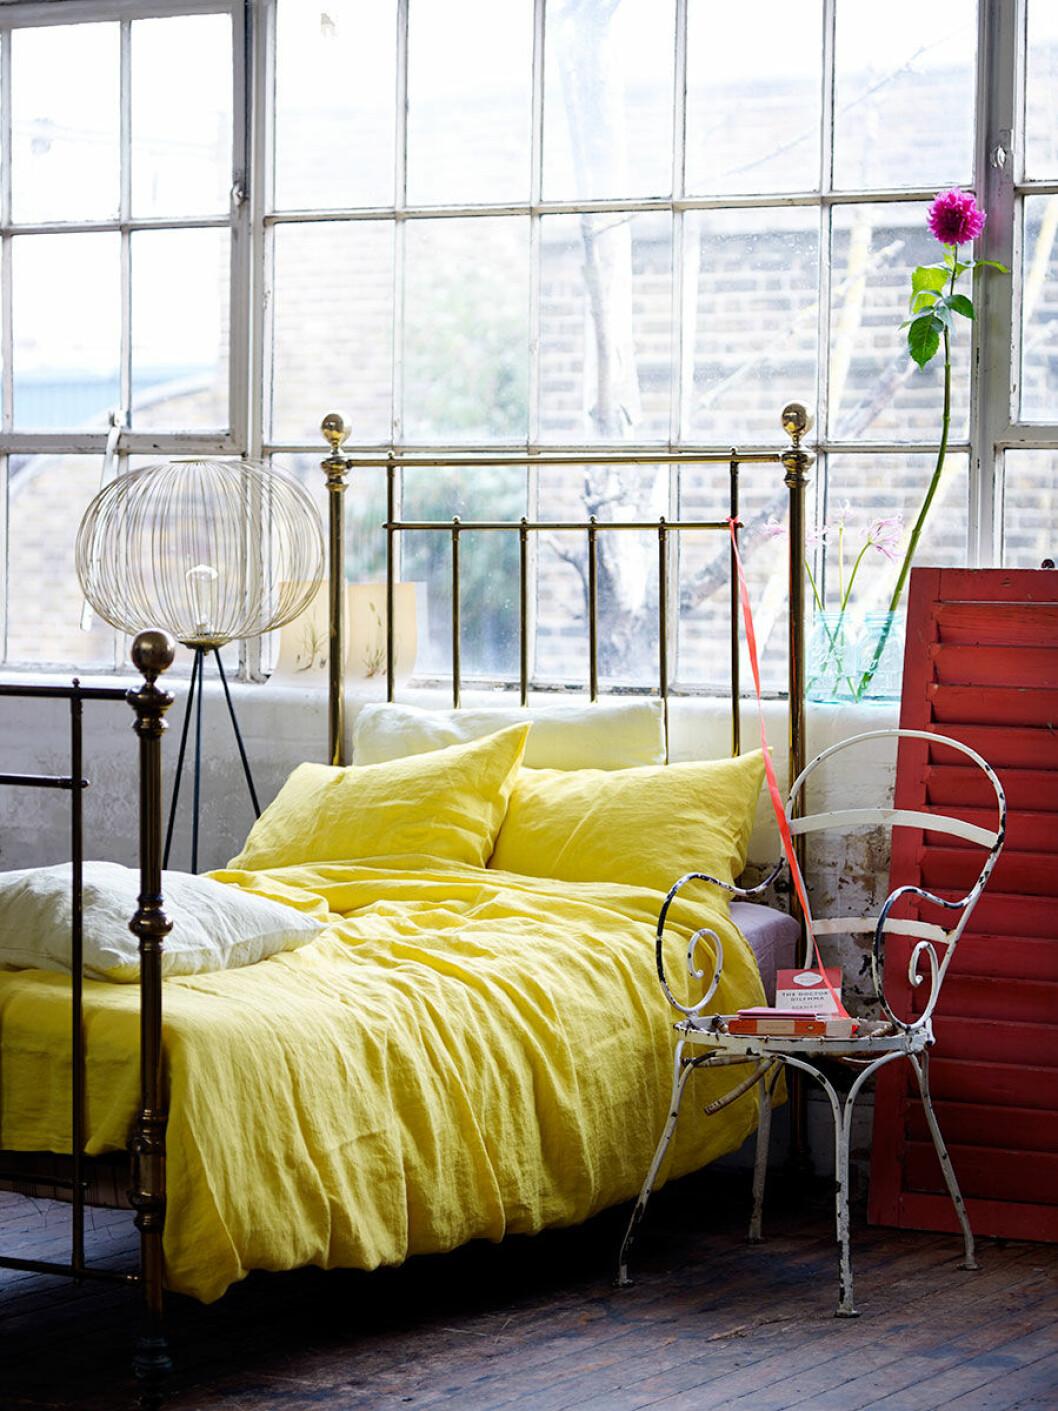 Hans_blomquist_sang_bed_yellow